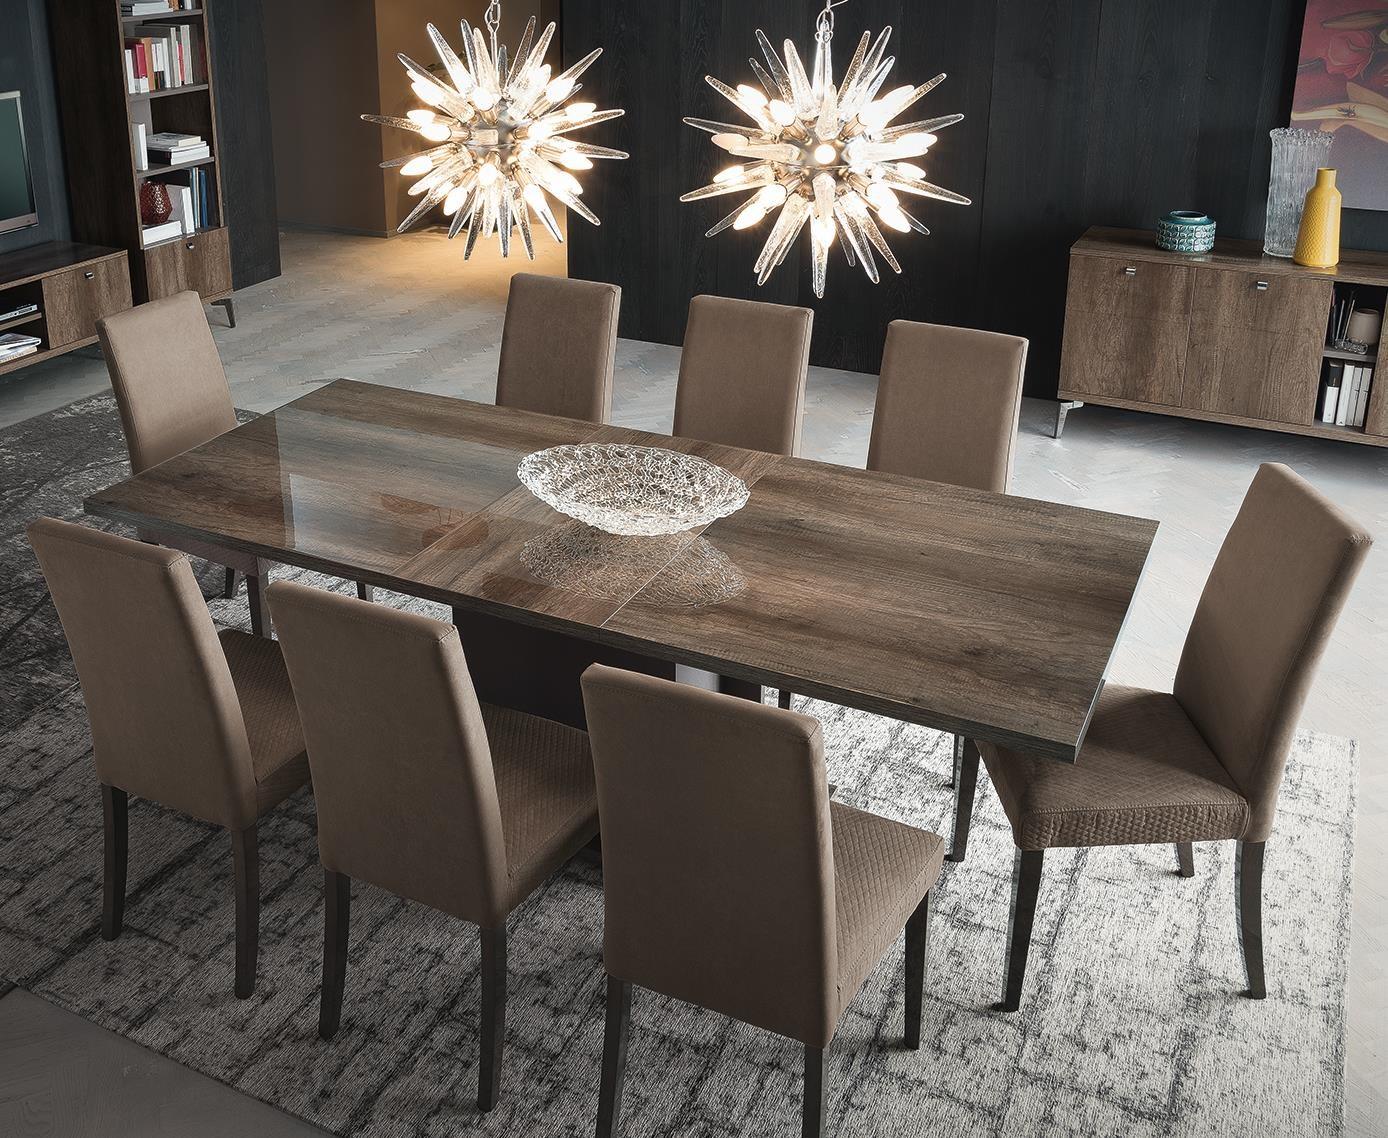 Vega Vega Table and Chair Set by Alf Italia at Upper Room Home Furnishings